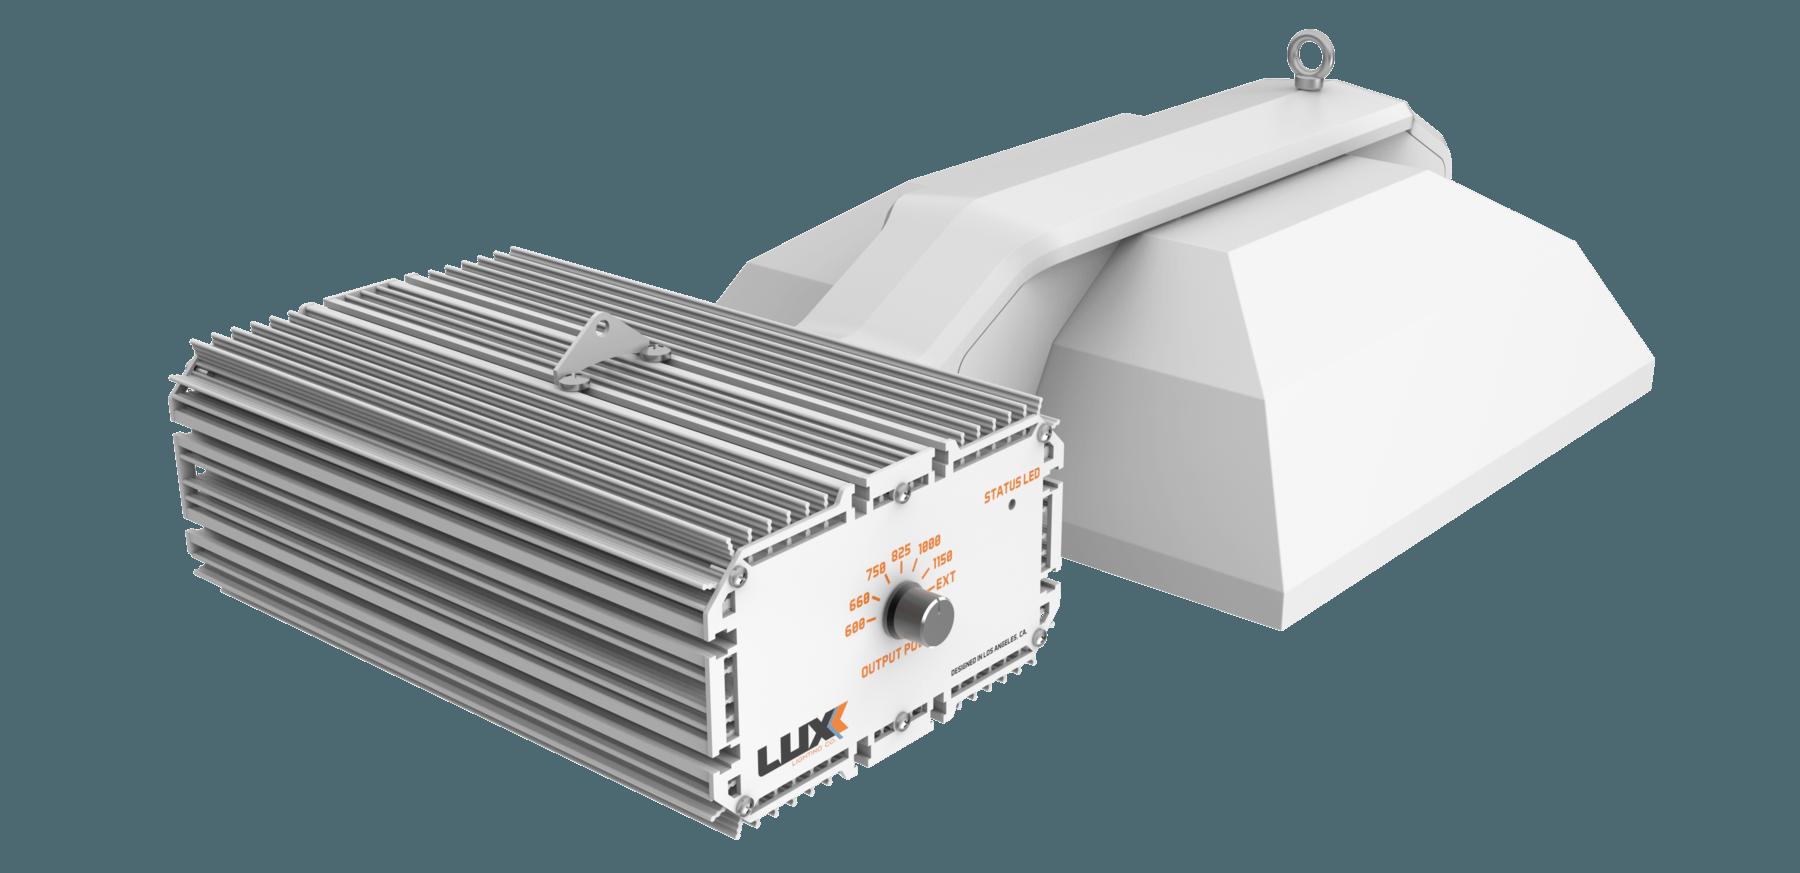 Equipo de iluminación Luxx Lighting 1000 W HPS DE